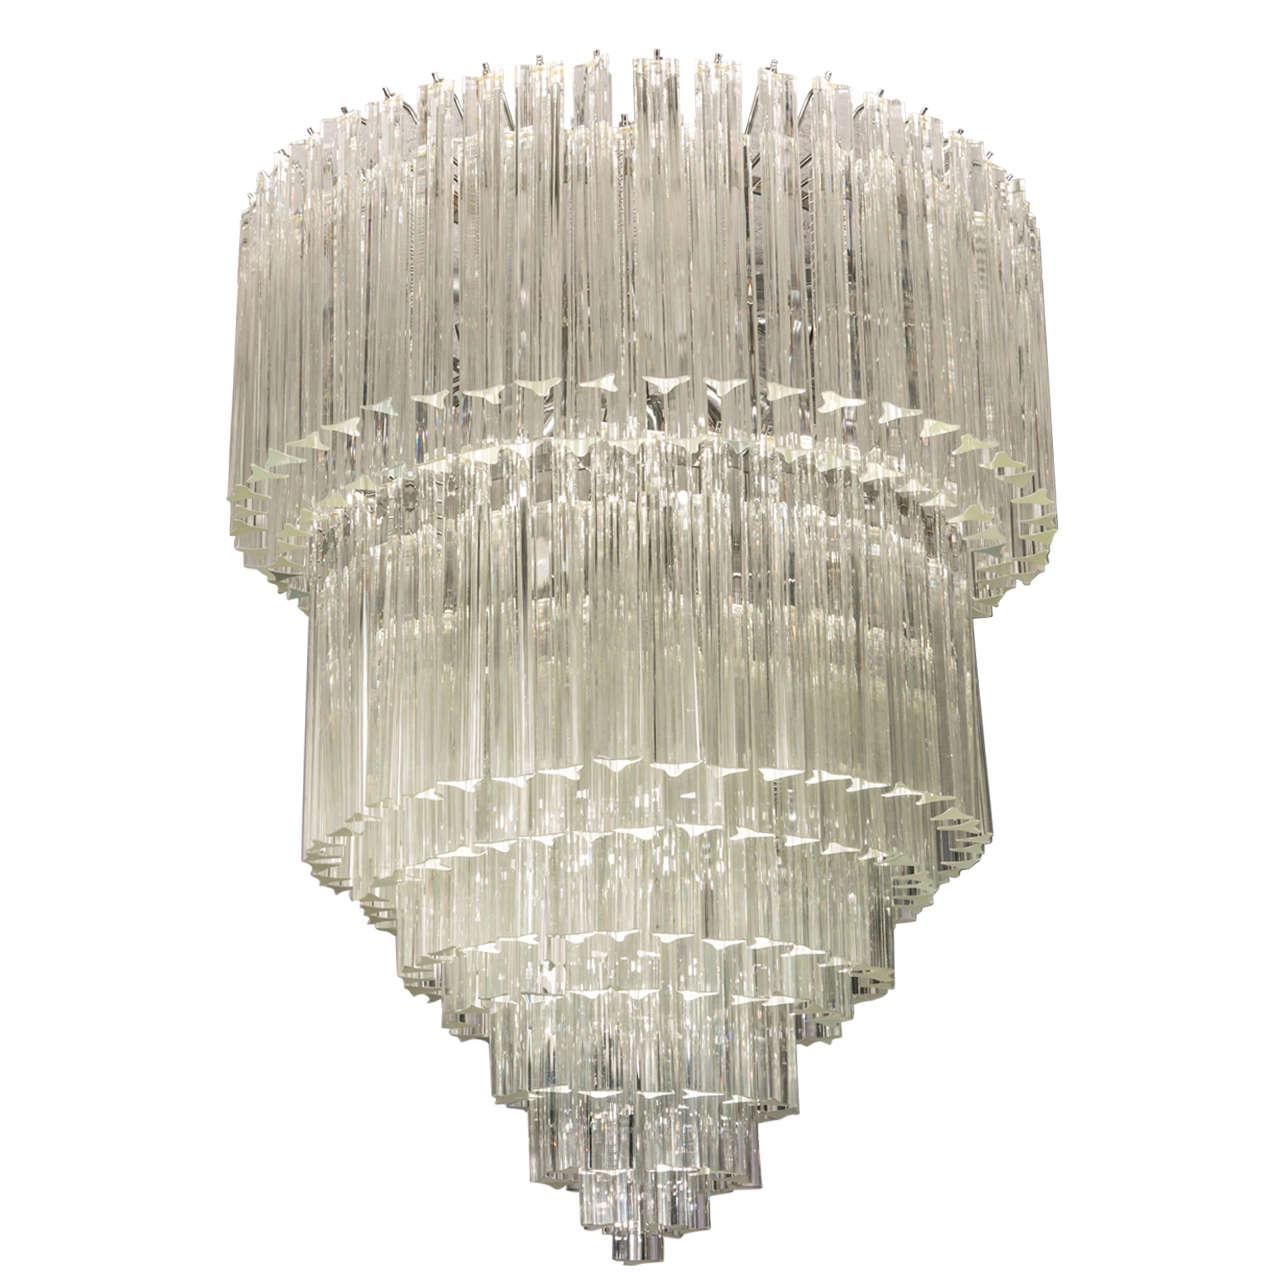 Murano venini chandelier at 1stdibs murano venini chandelier for sale aloadofball Image collections